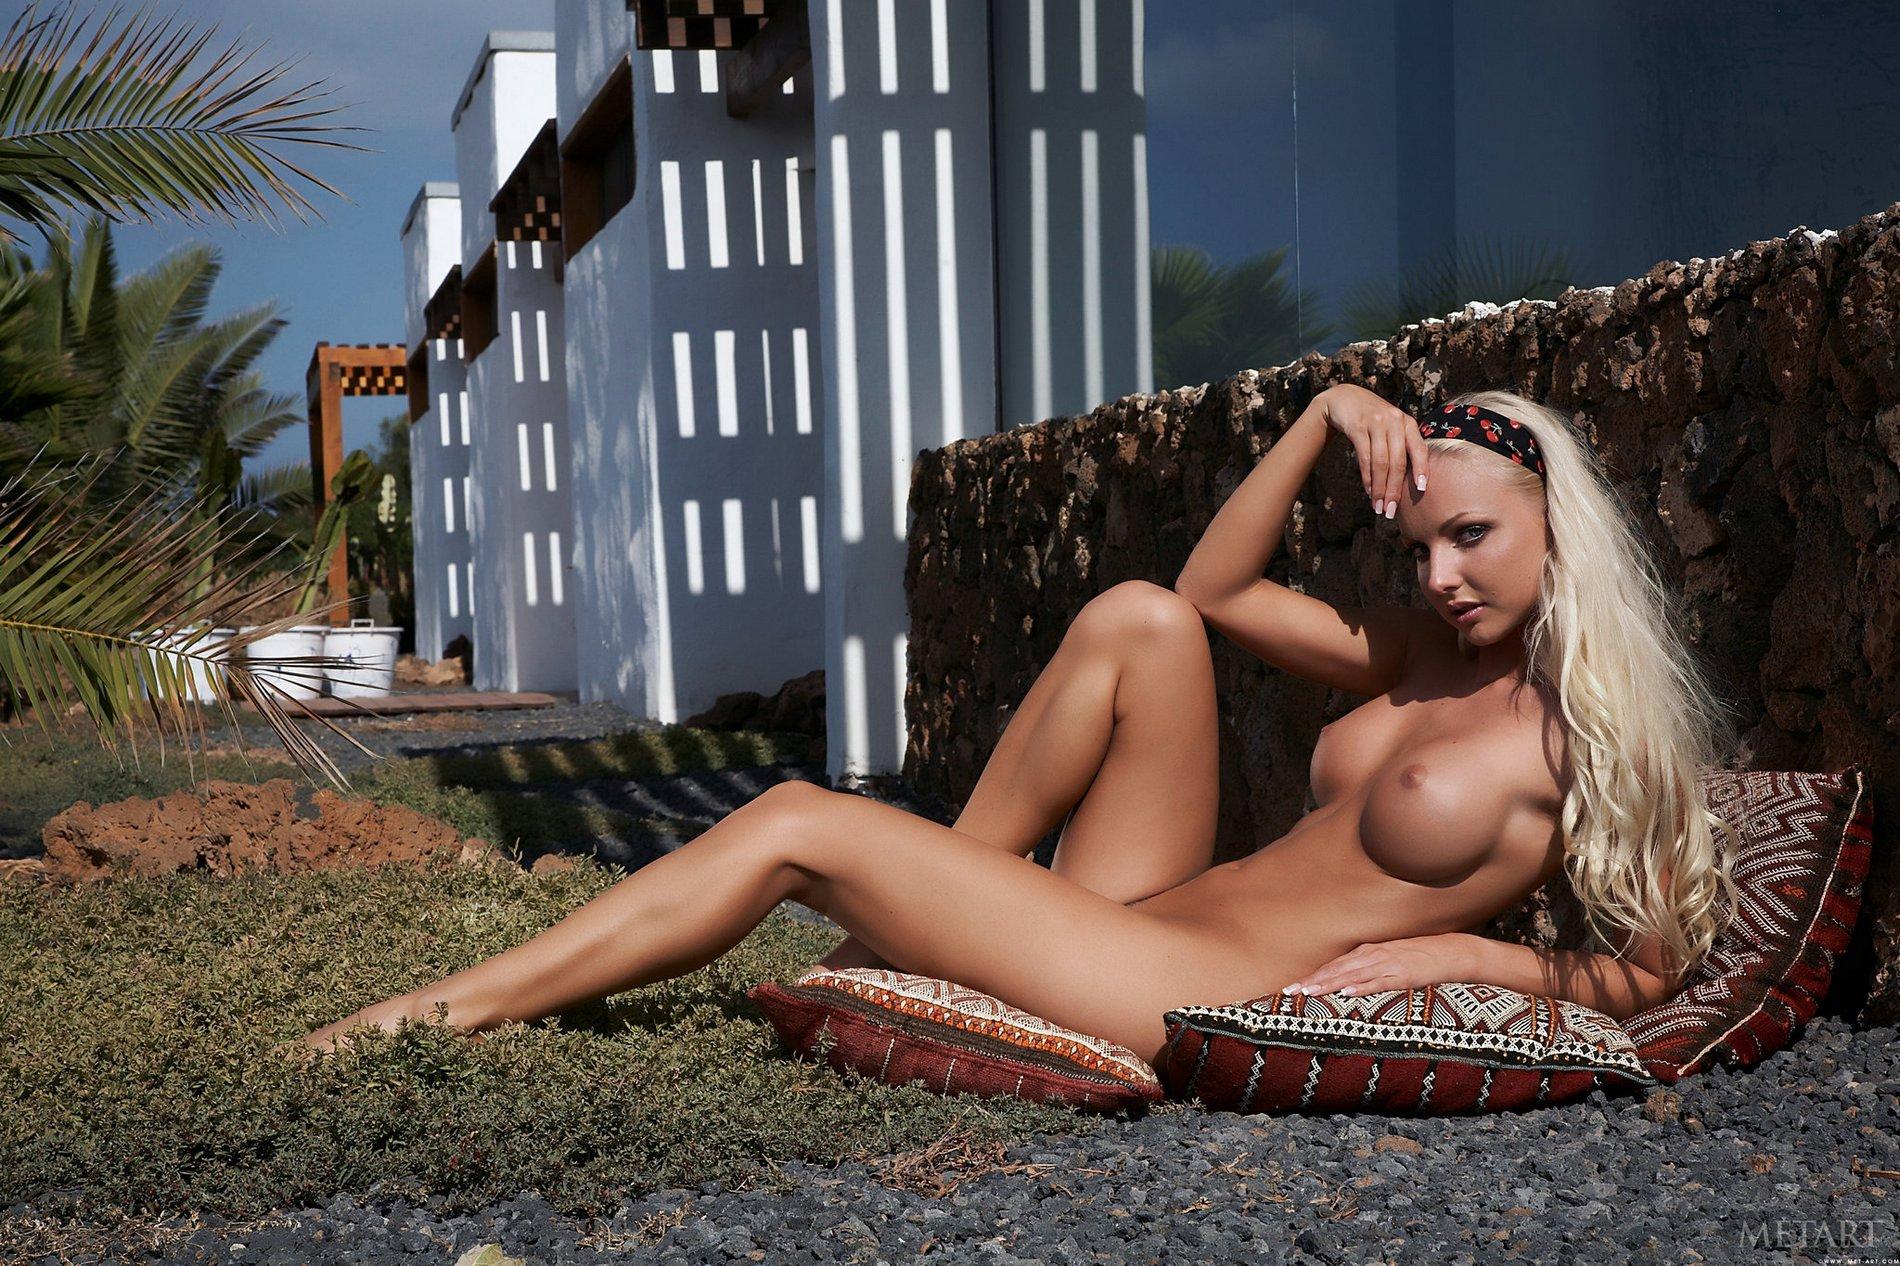 Veronika Simon poses naked outdoor - My Pornstar Book